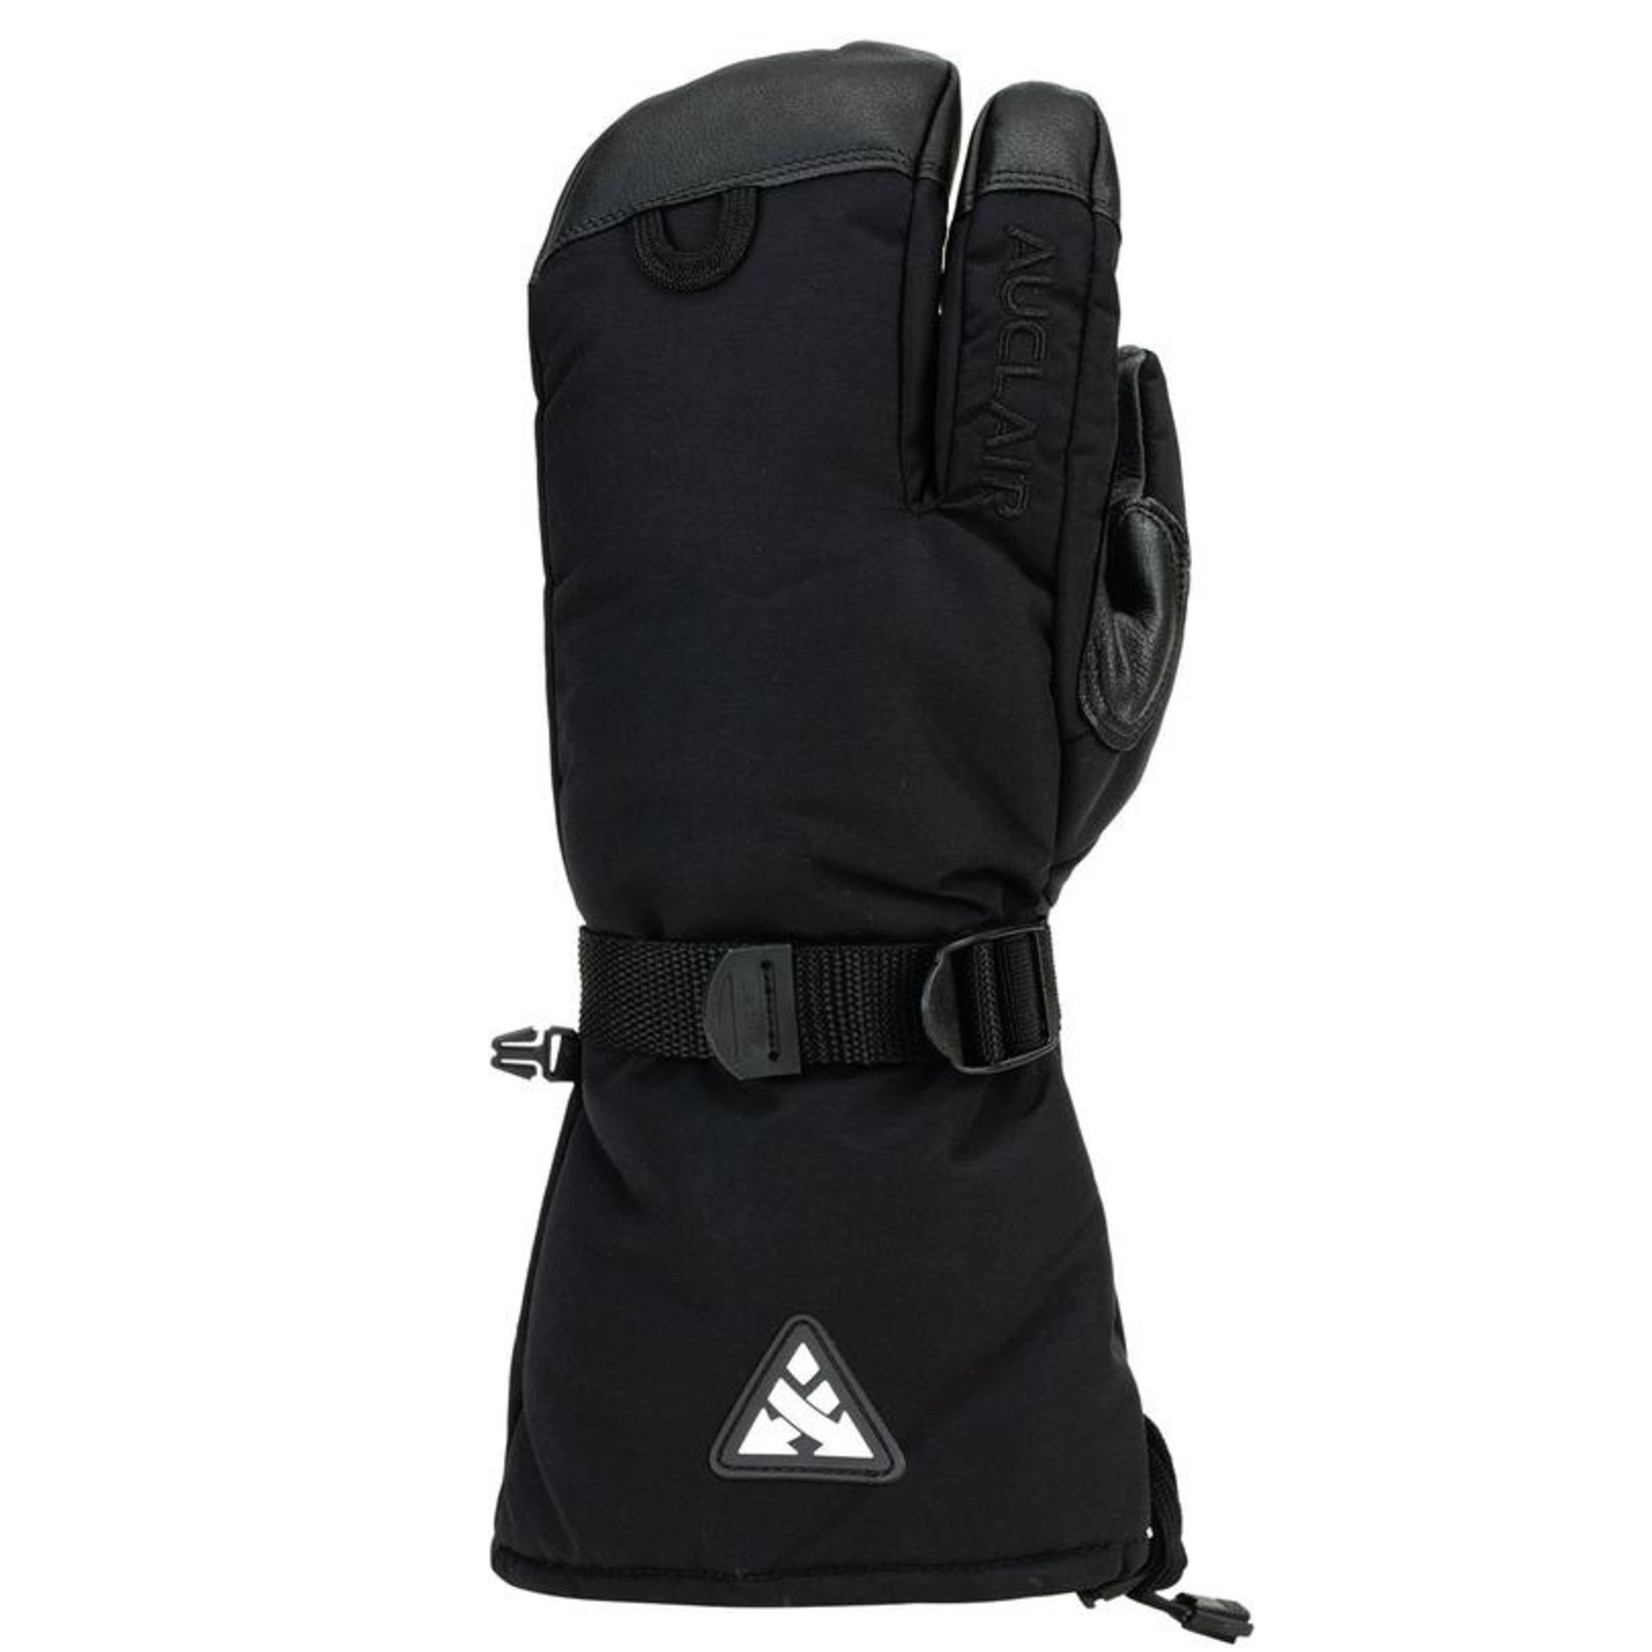 Auclair Auclair Back Country 3-Finger Glove Men's